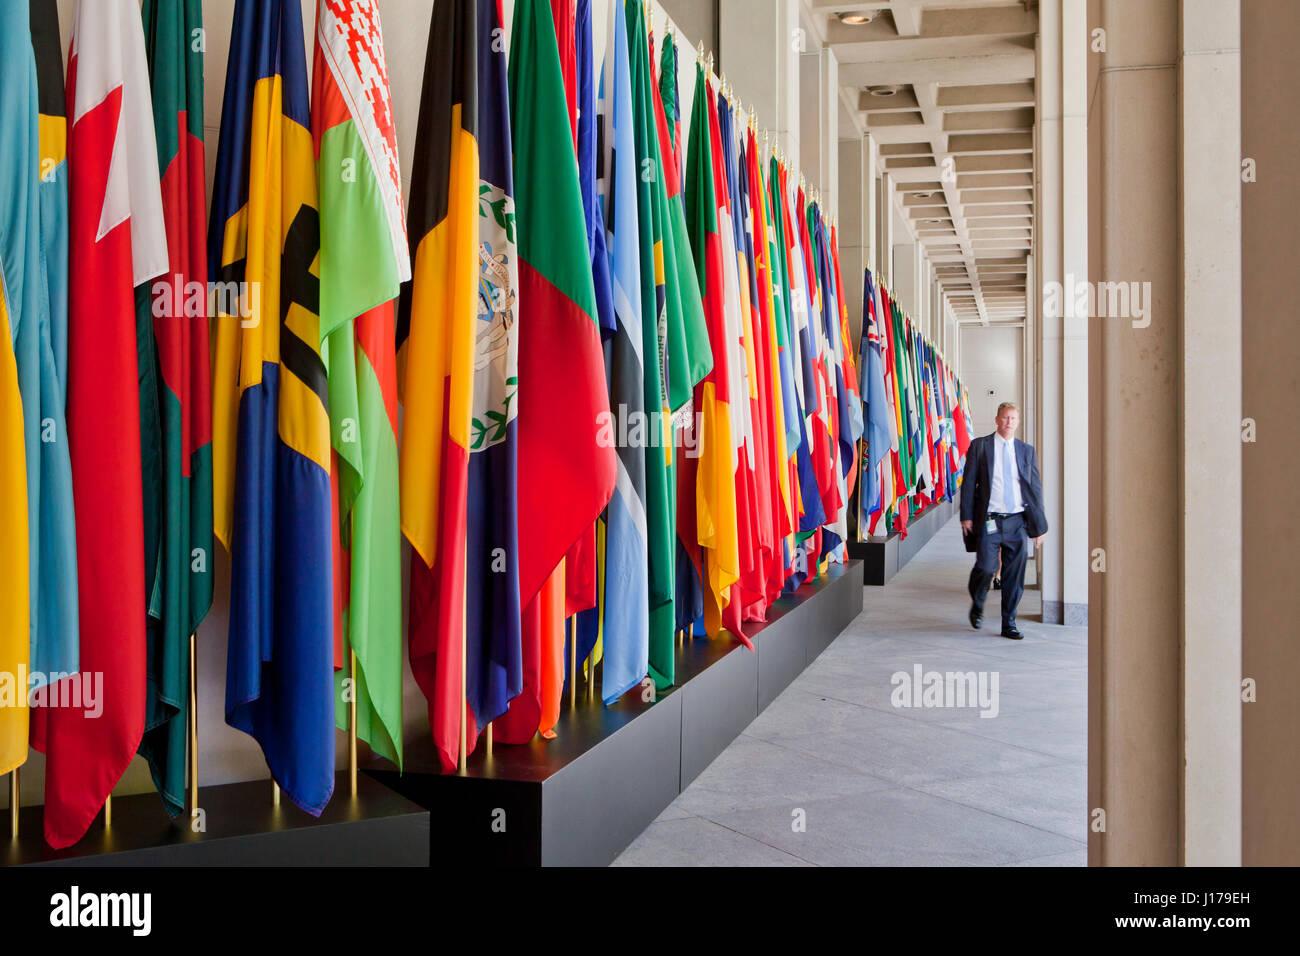 Washington, USA. 18th Apr, 2017. The 2017 International Monetary Fund (IMF) Spring Meetings are underway in Washington, - Stock Image